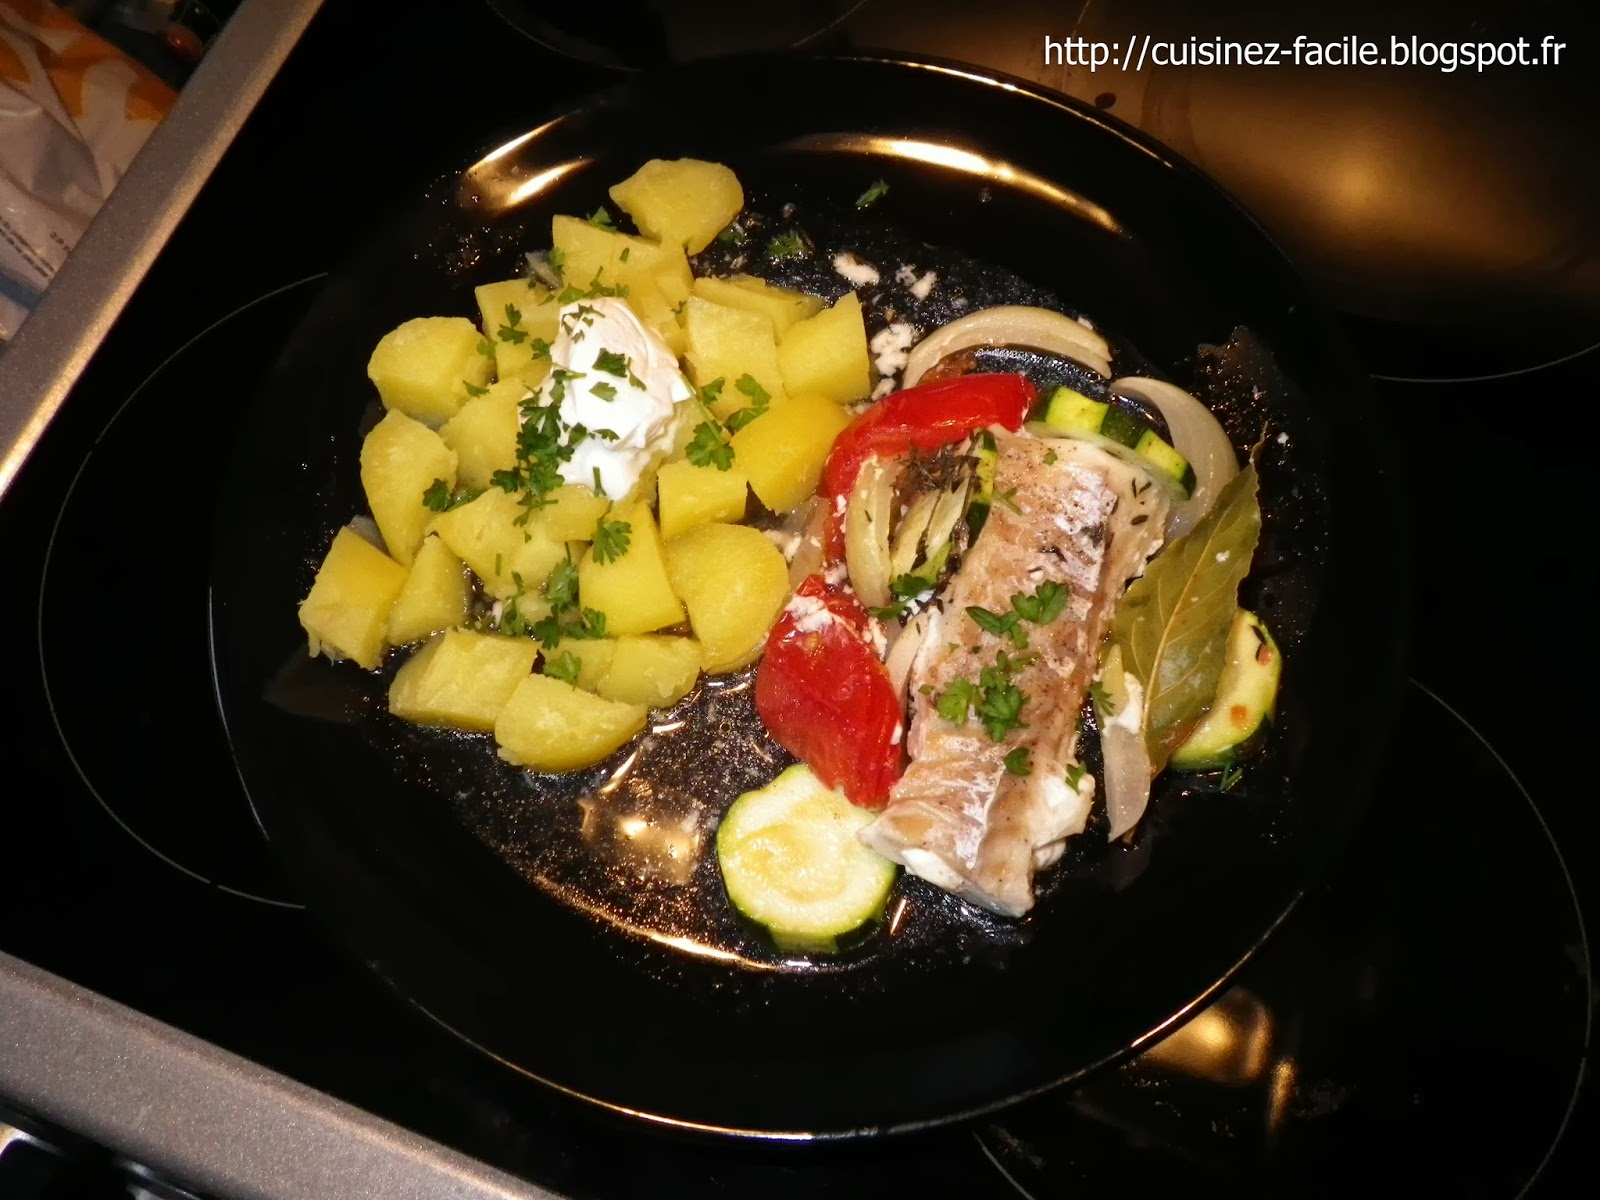 Cuisinez facile easy cooking dos de cabillaud en papillote - Cuisiner dos cabillaud ...